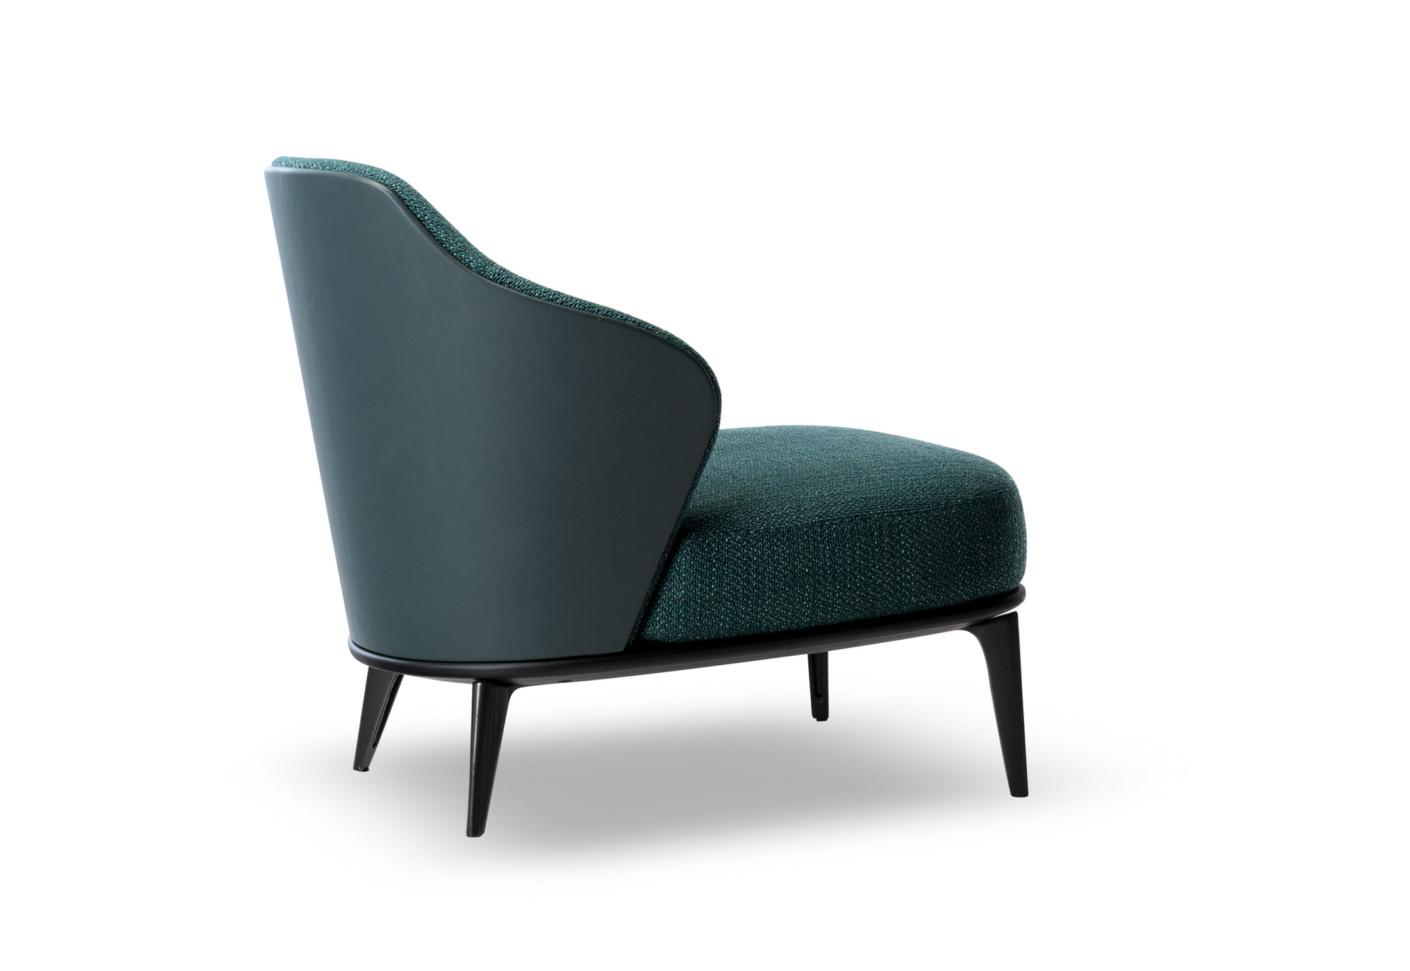 Leslie Armchair By Minotti Stylepark